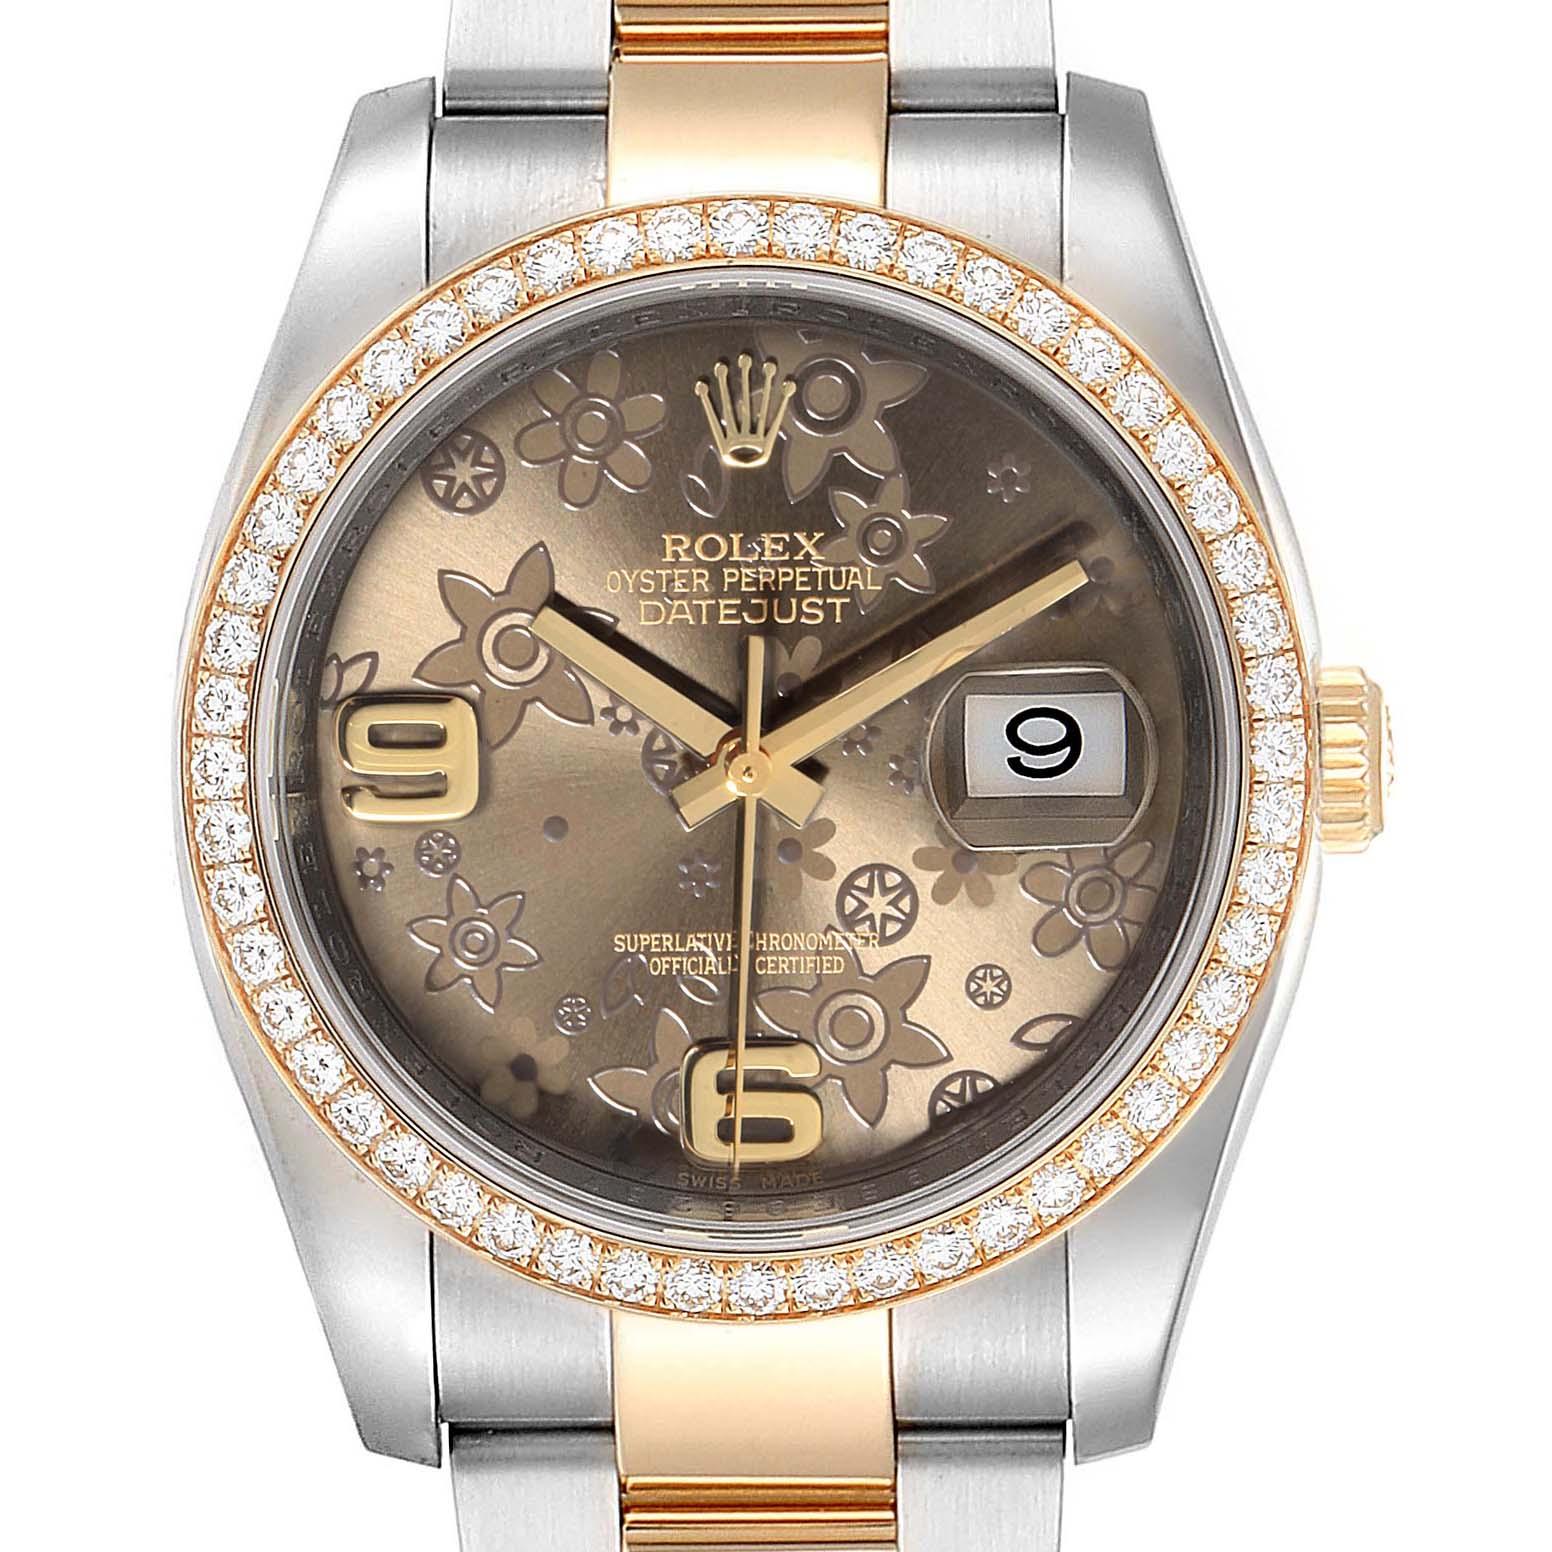 Photo of Rolex Datejust 36 Steel Yellow Gold Bronze Flower Dial Watch 116243